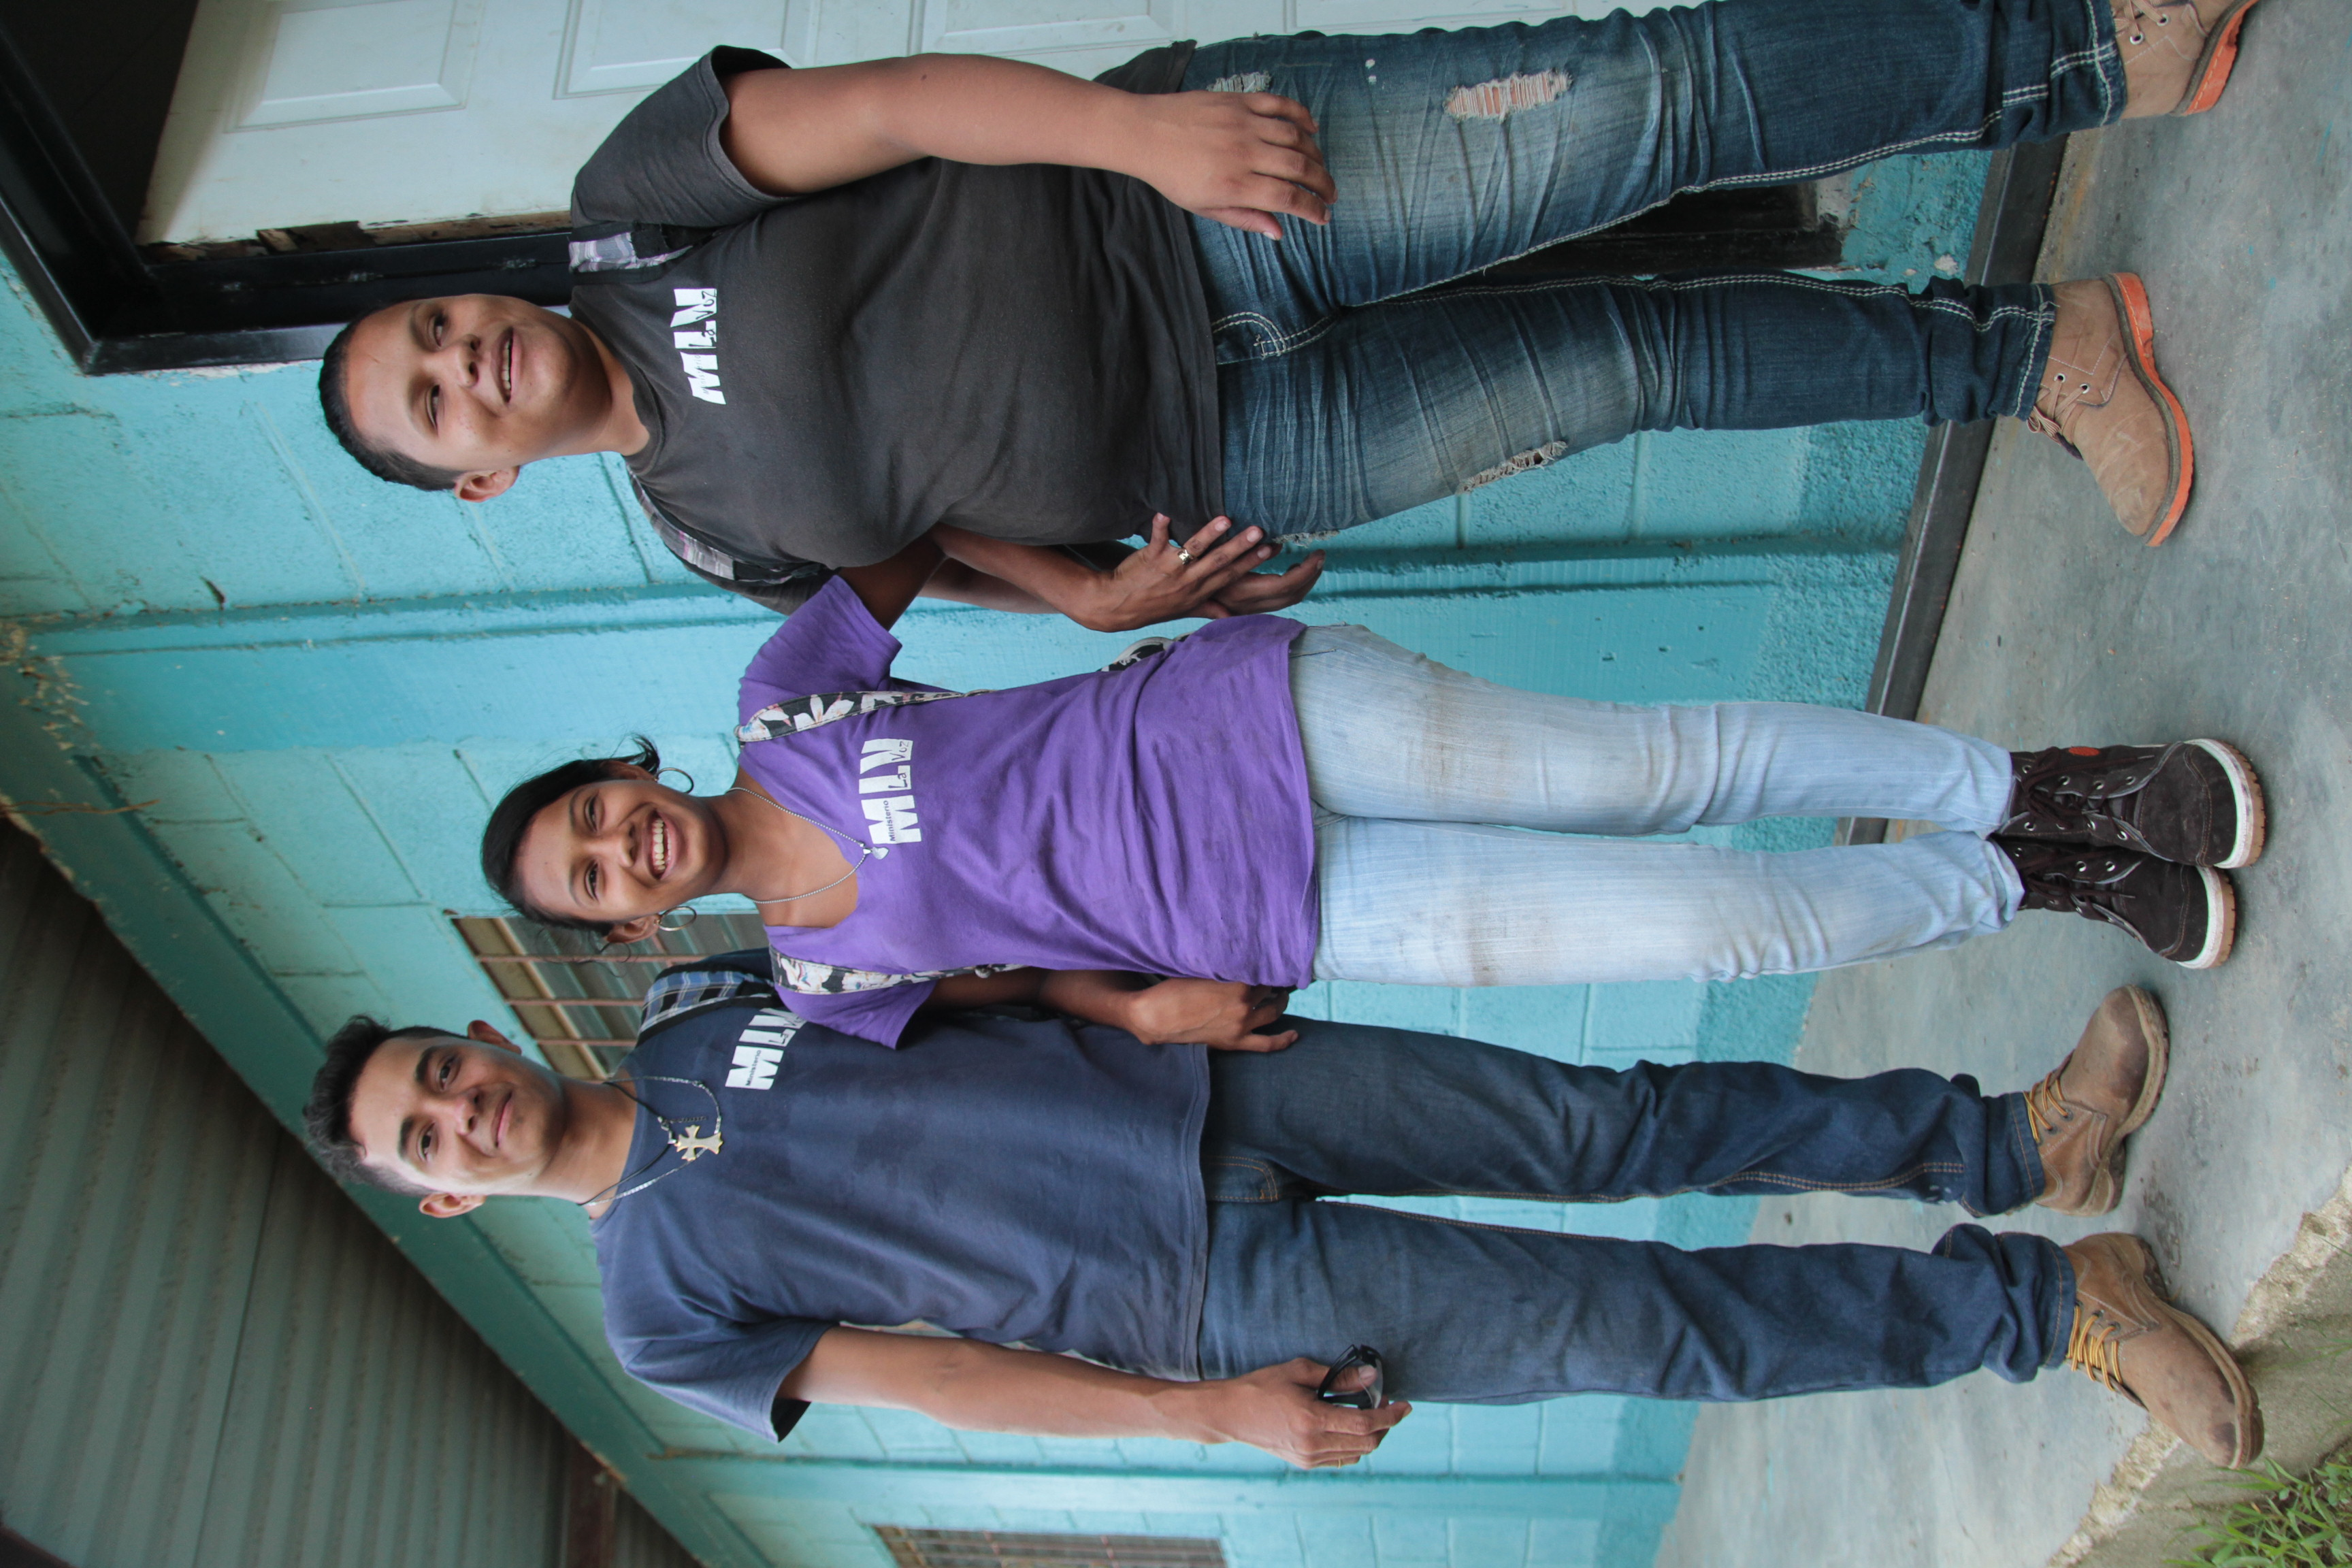 Frank, Itza, and Nicol